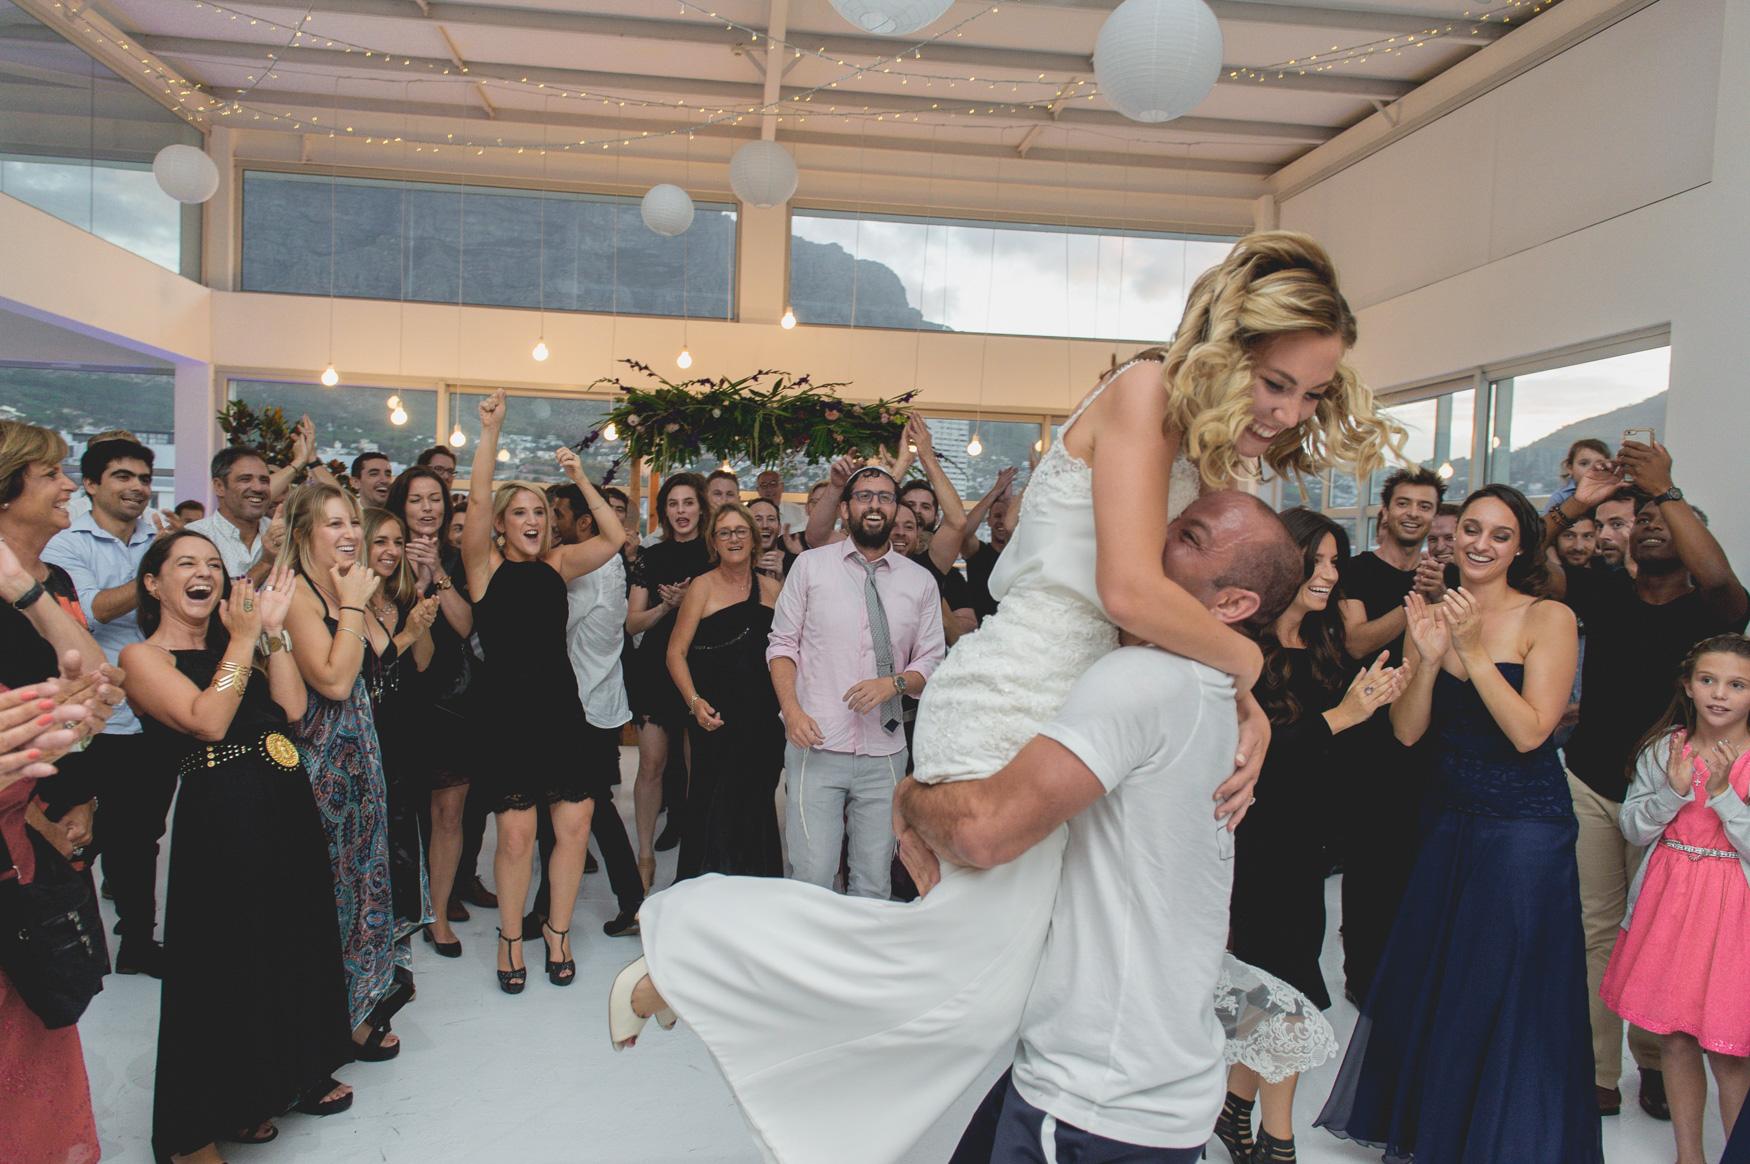 john-henry-wedding-photographer-mike-louise-001-26.jpg